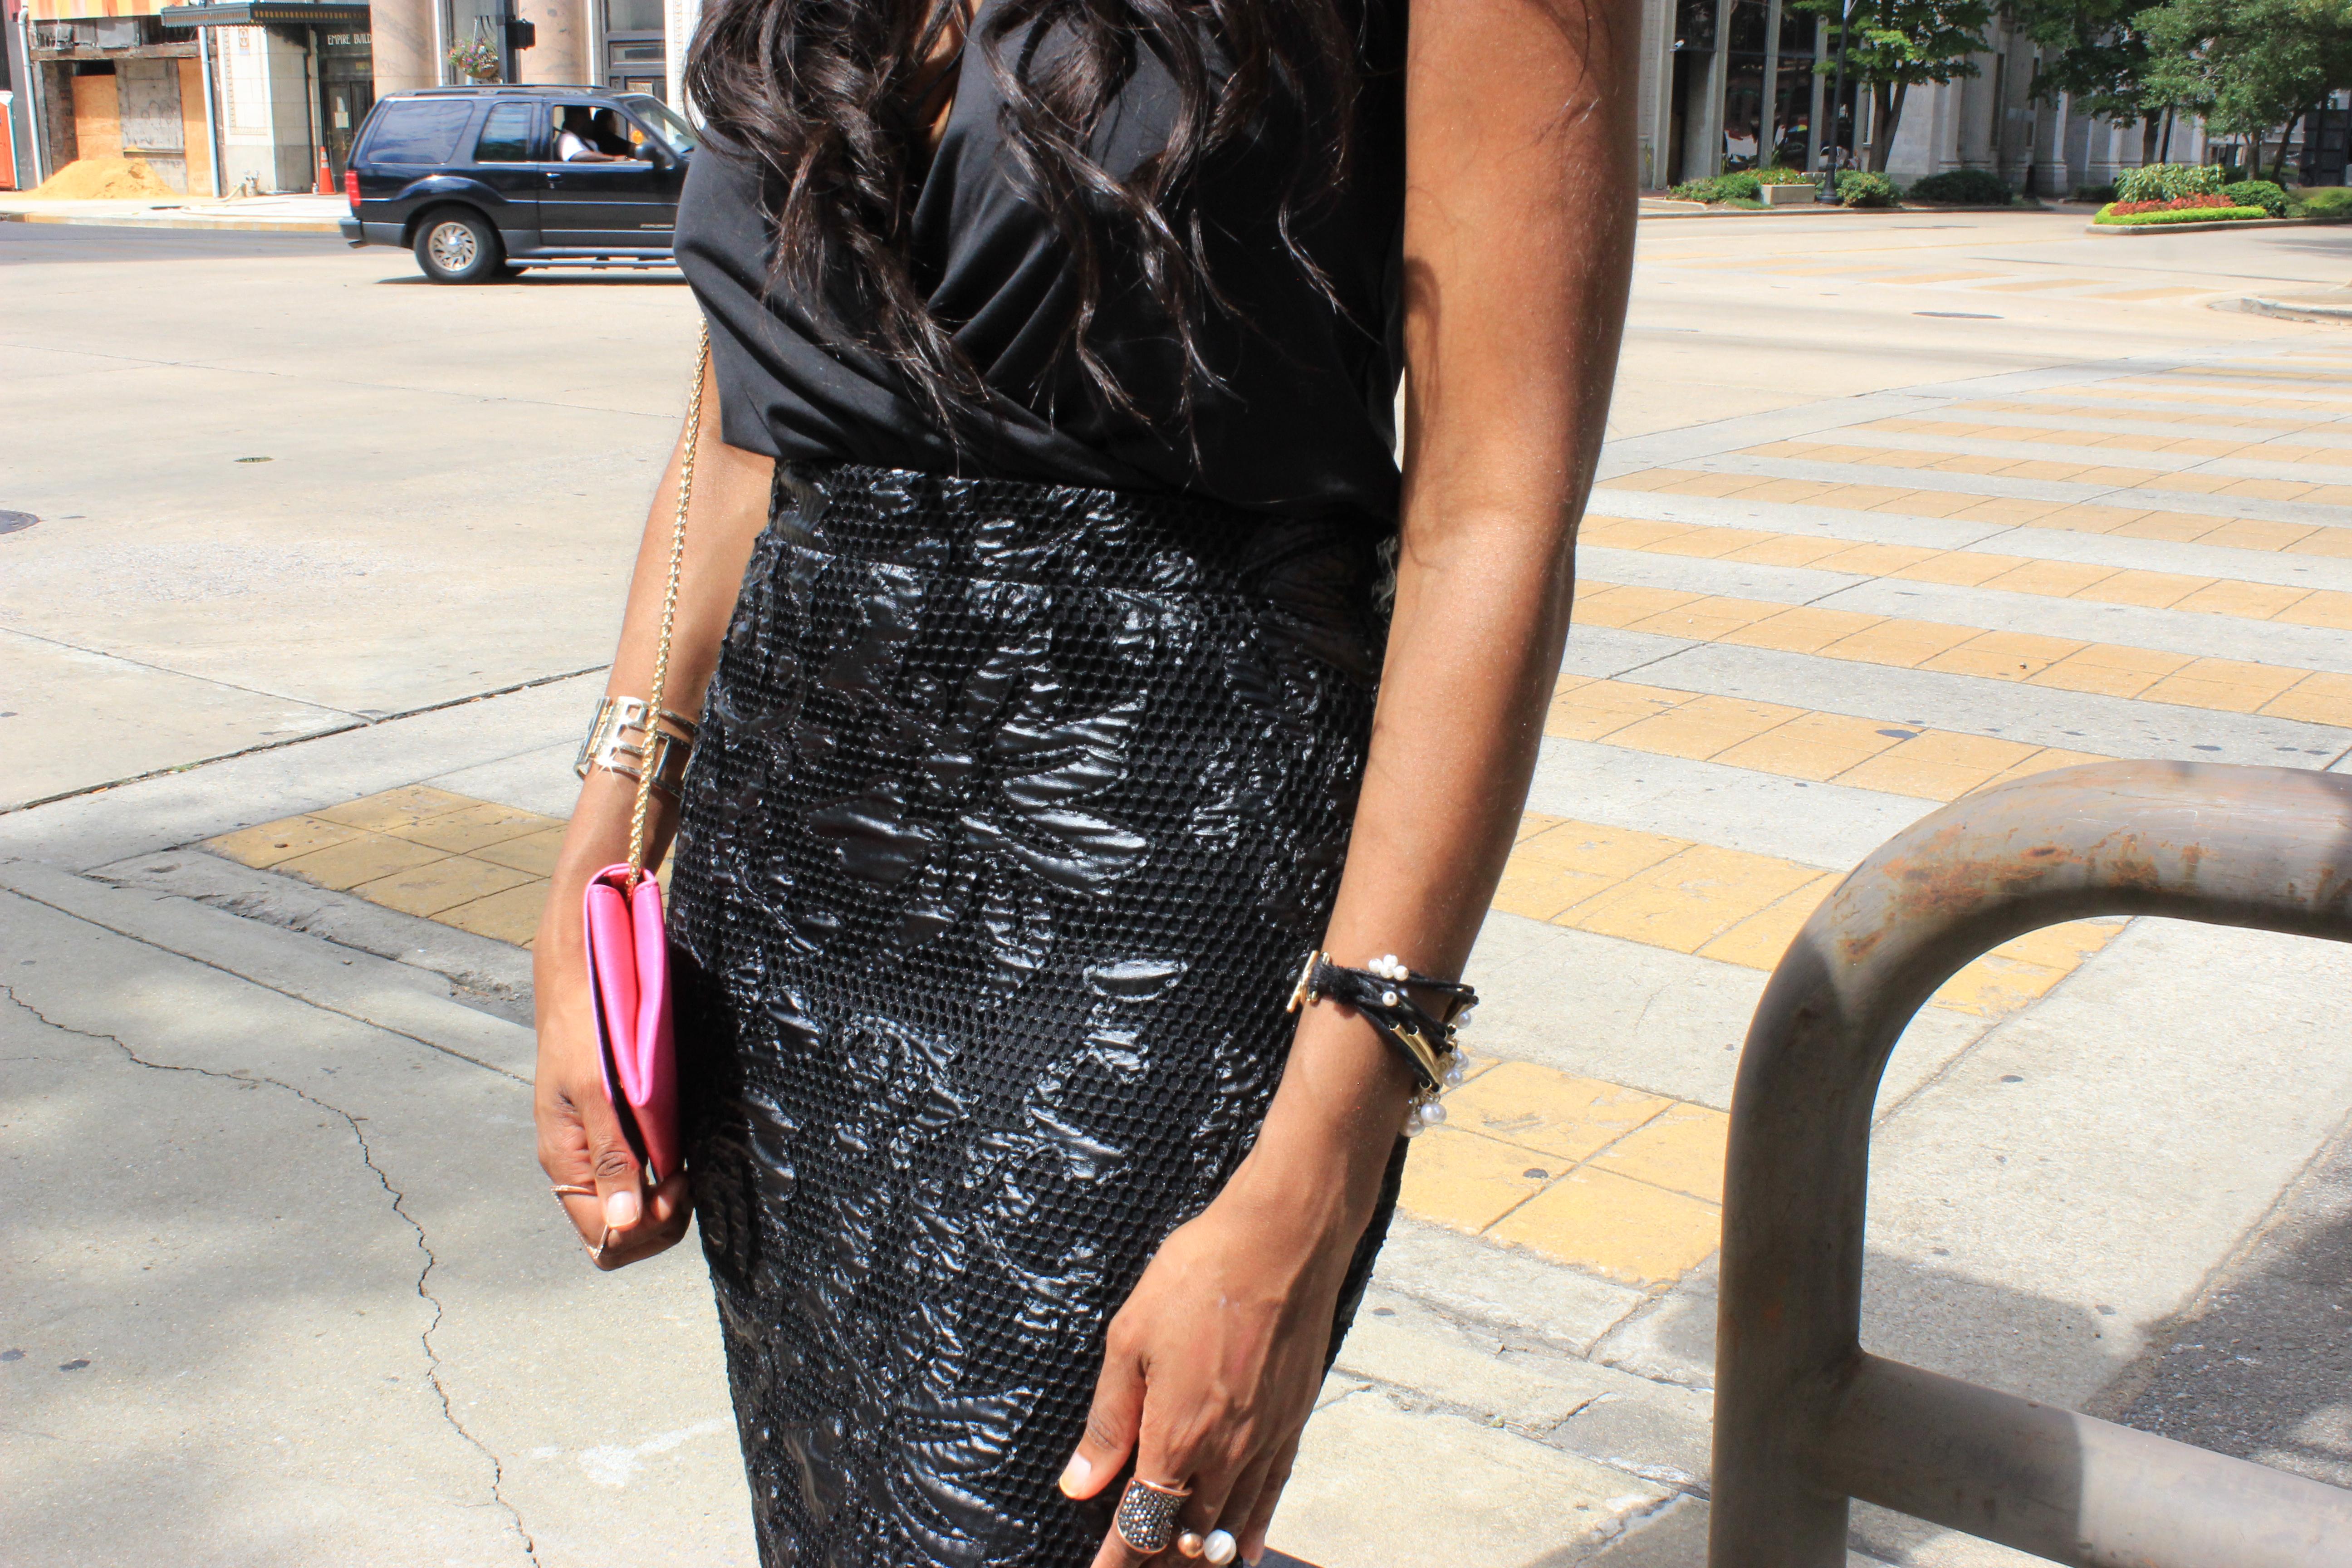 Style-Files-Forever-21-black-lace-pencil-skirt-victoria-secret-black-vneck-bodysuit-all-black-fashion-look-Zara-vinyl-d-orsay-pumps-oohlalablog-16